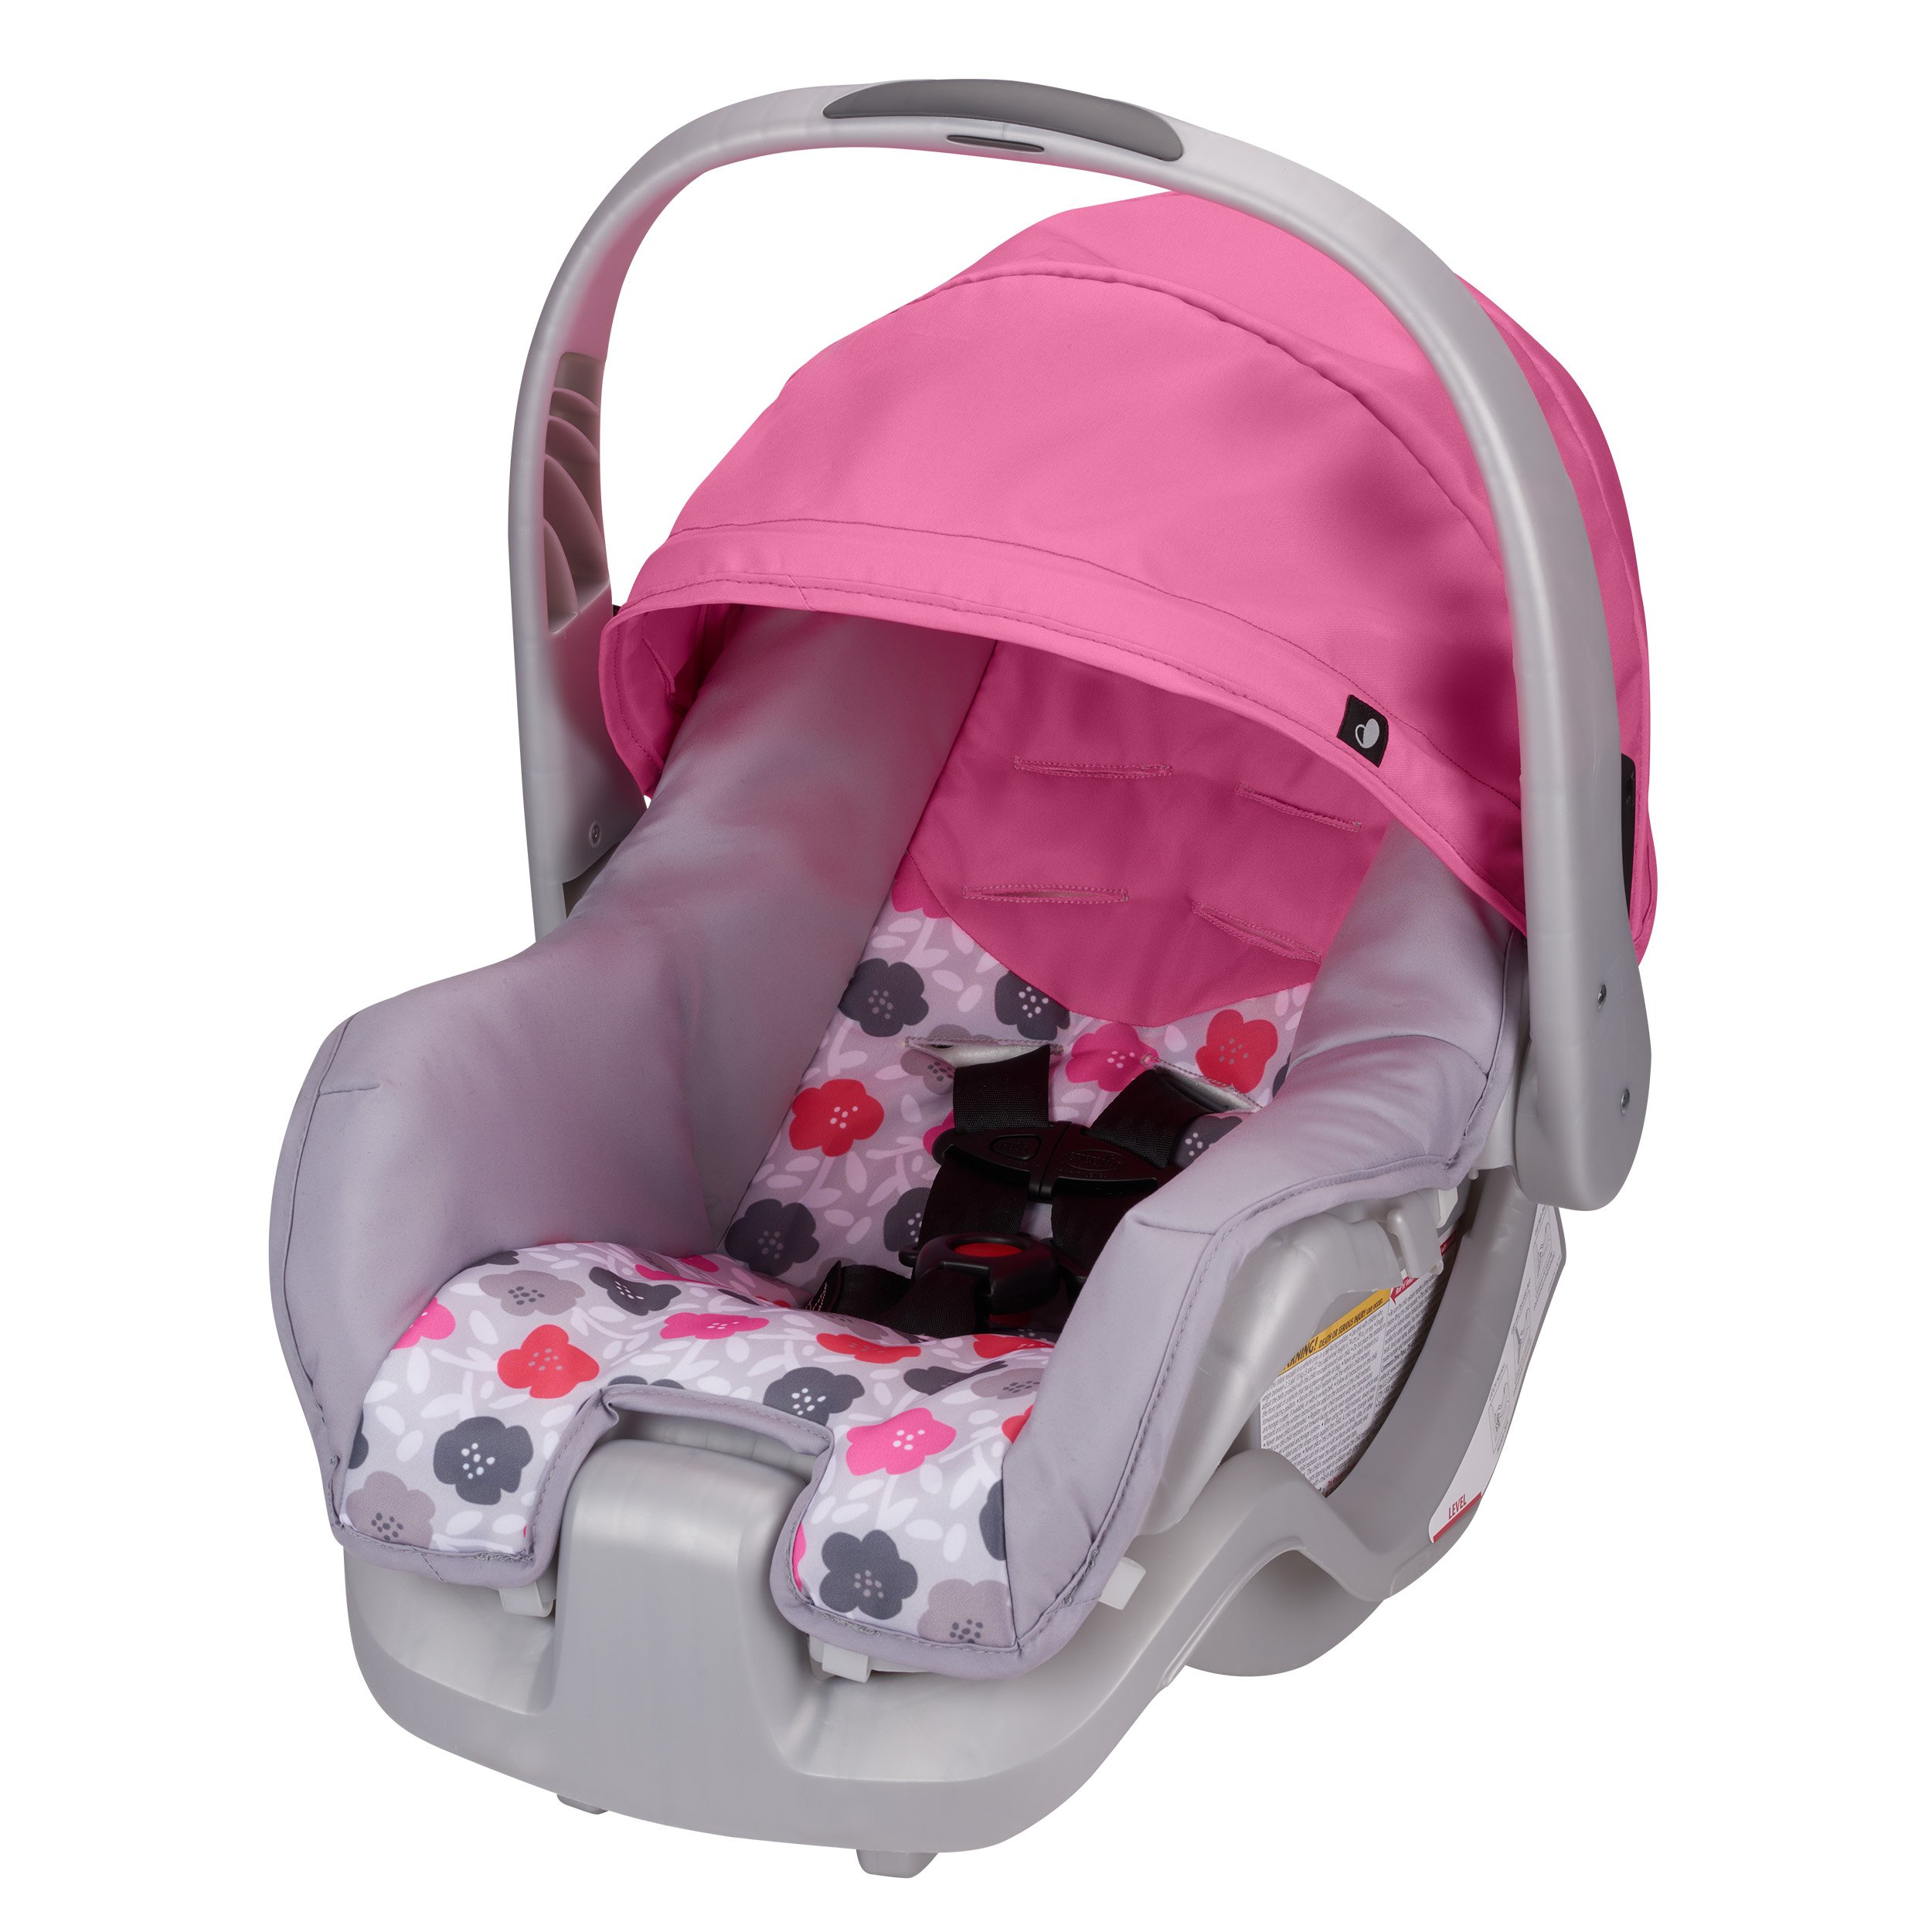 Amazon Evenflo Nurture Infant Car Seat Teal Confetti Baby